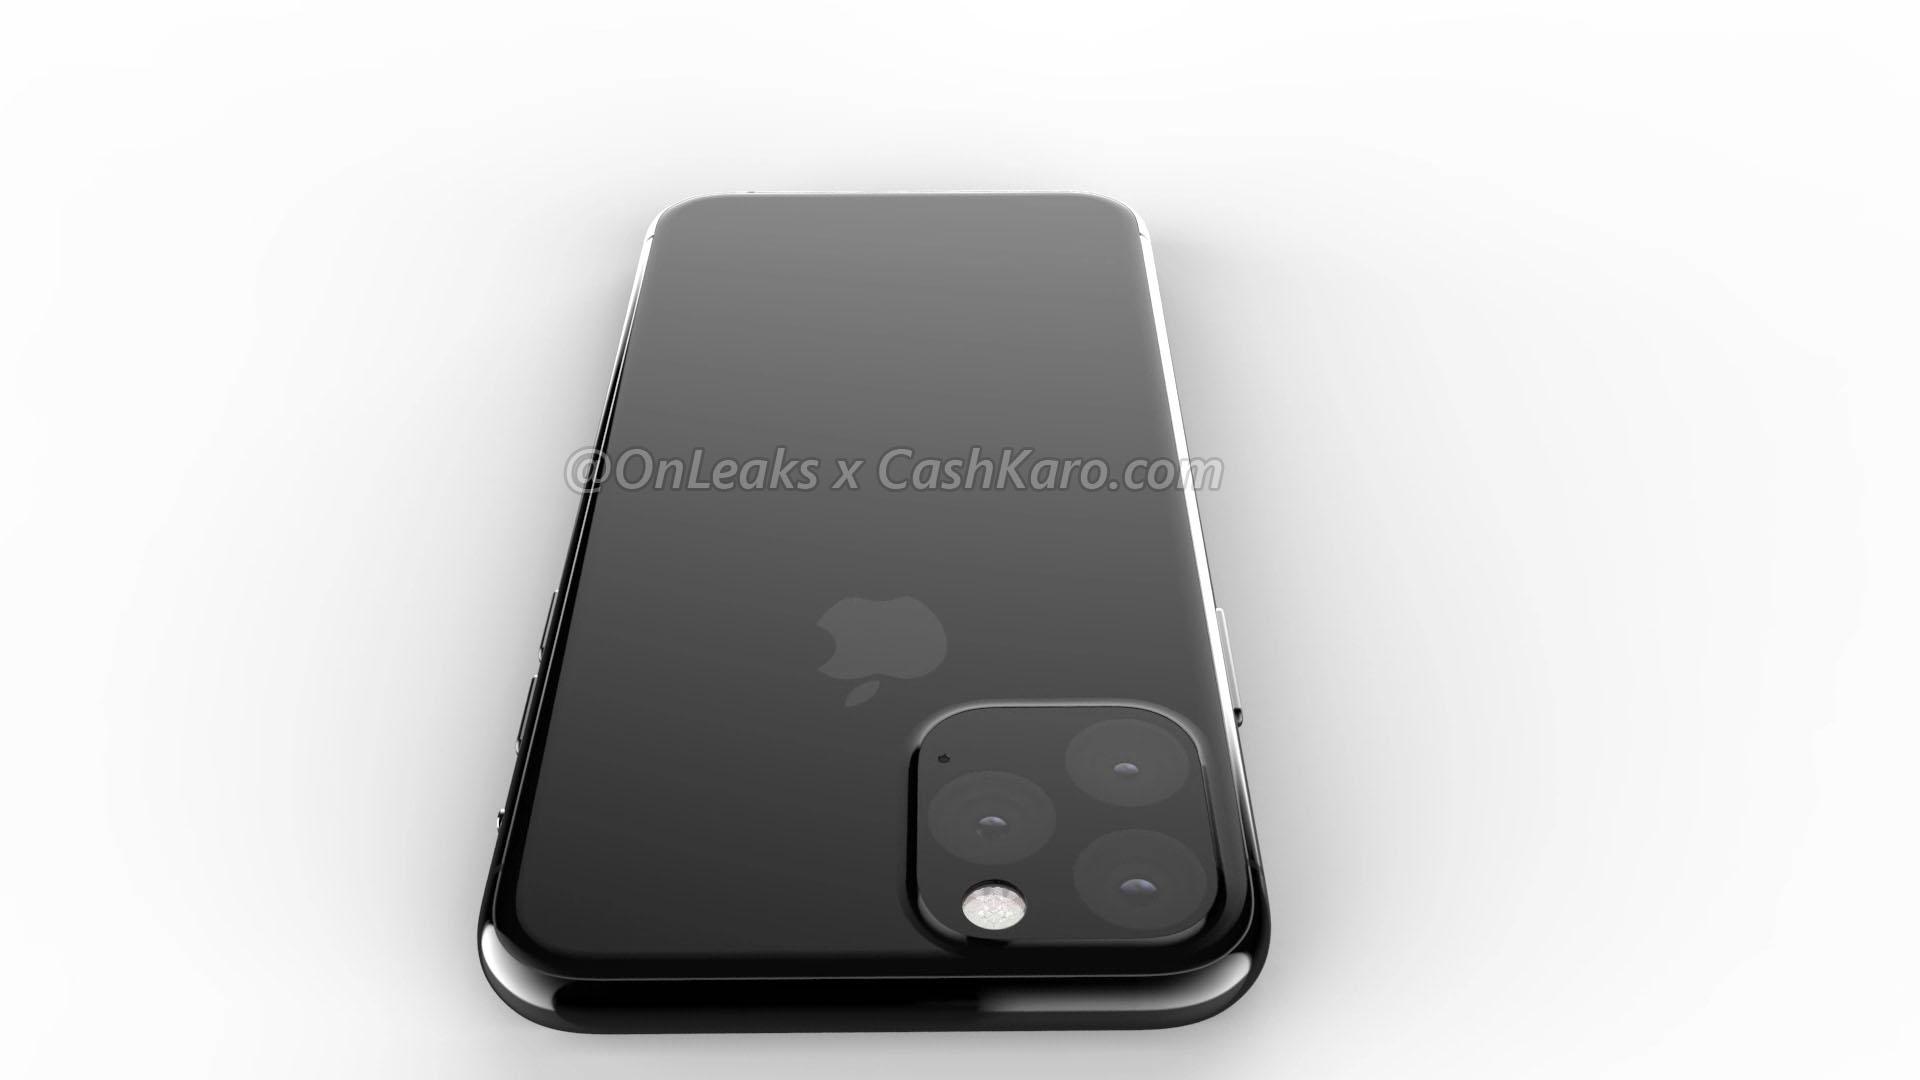 iPhone-XI-011 Cashkaro